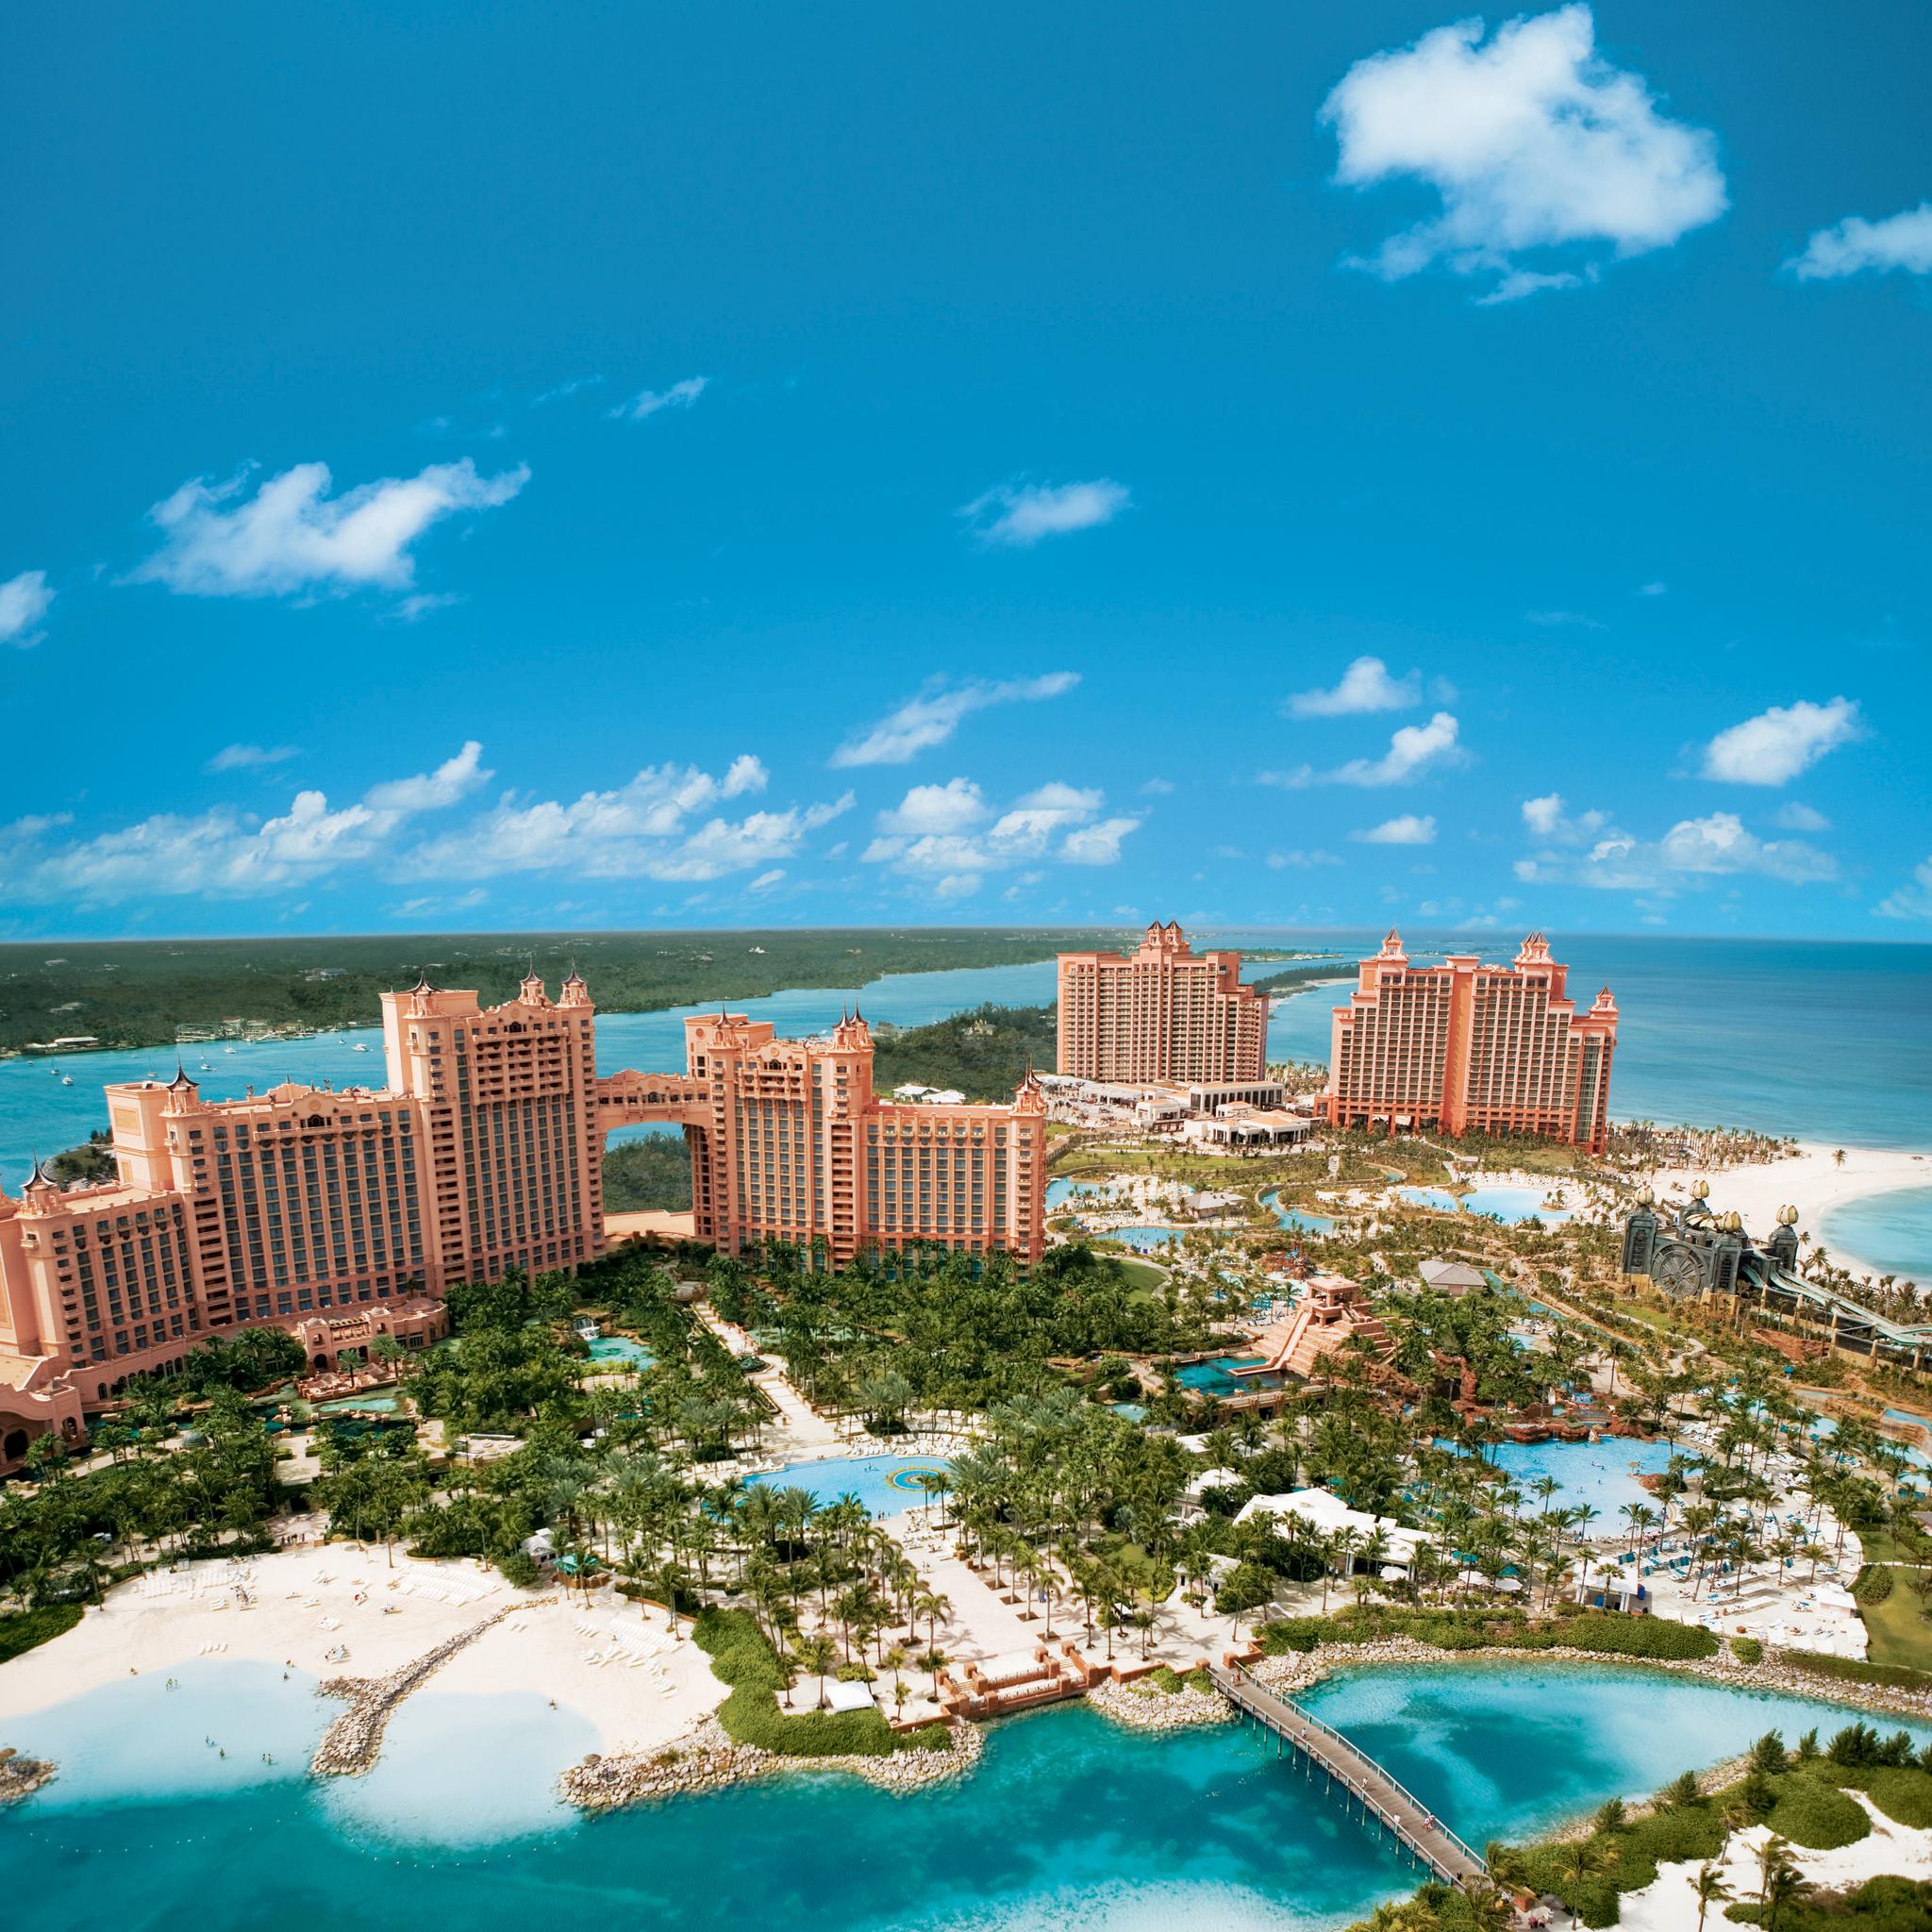 Atlantis-Paradise-Dubai-3Wallpapers-ipad-Retina